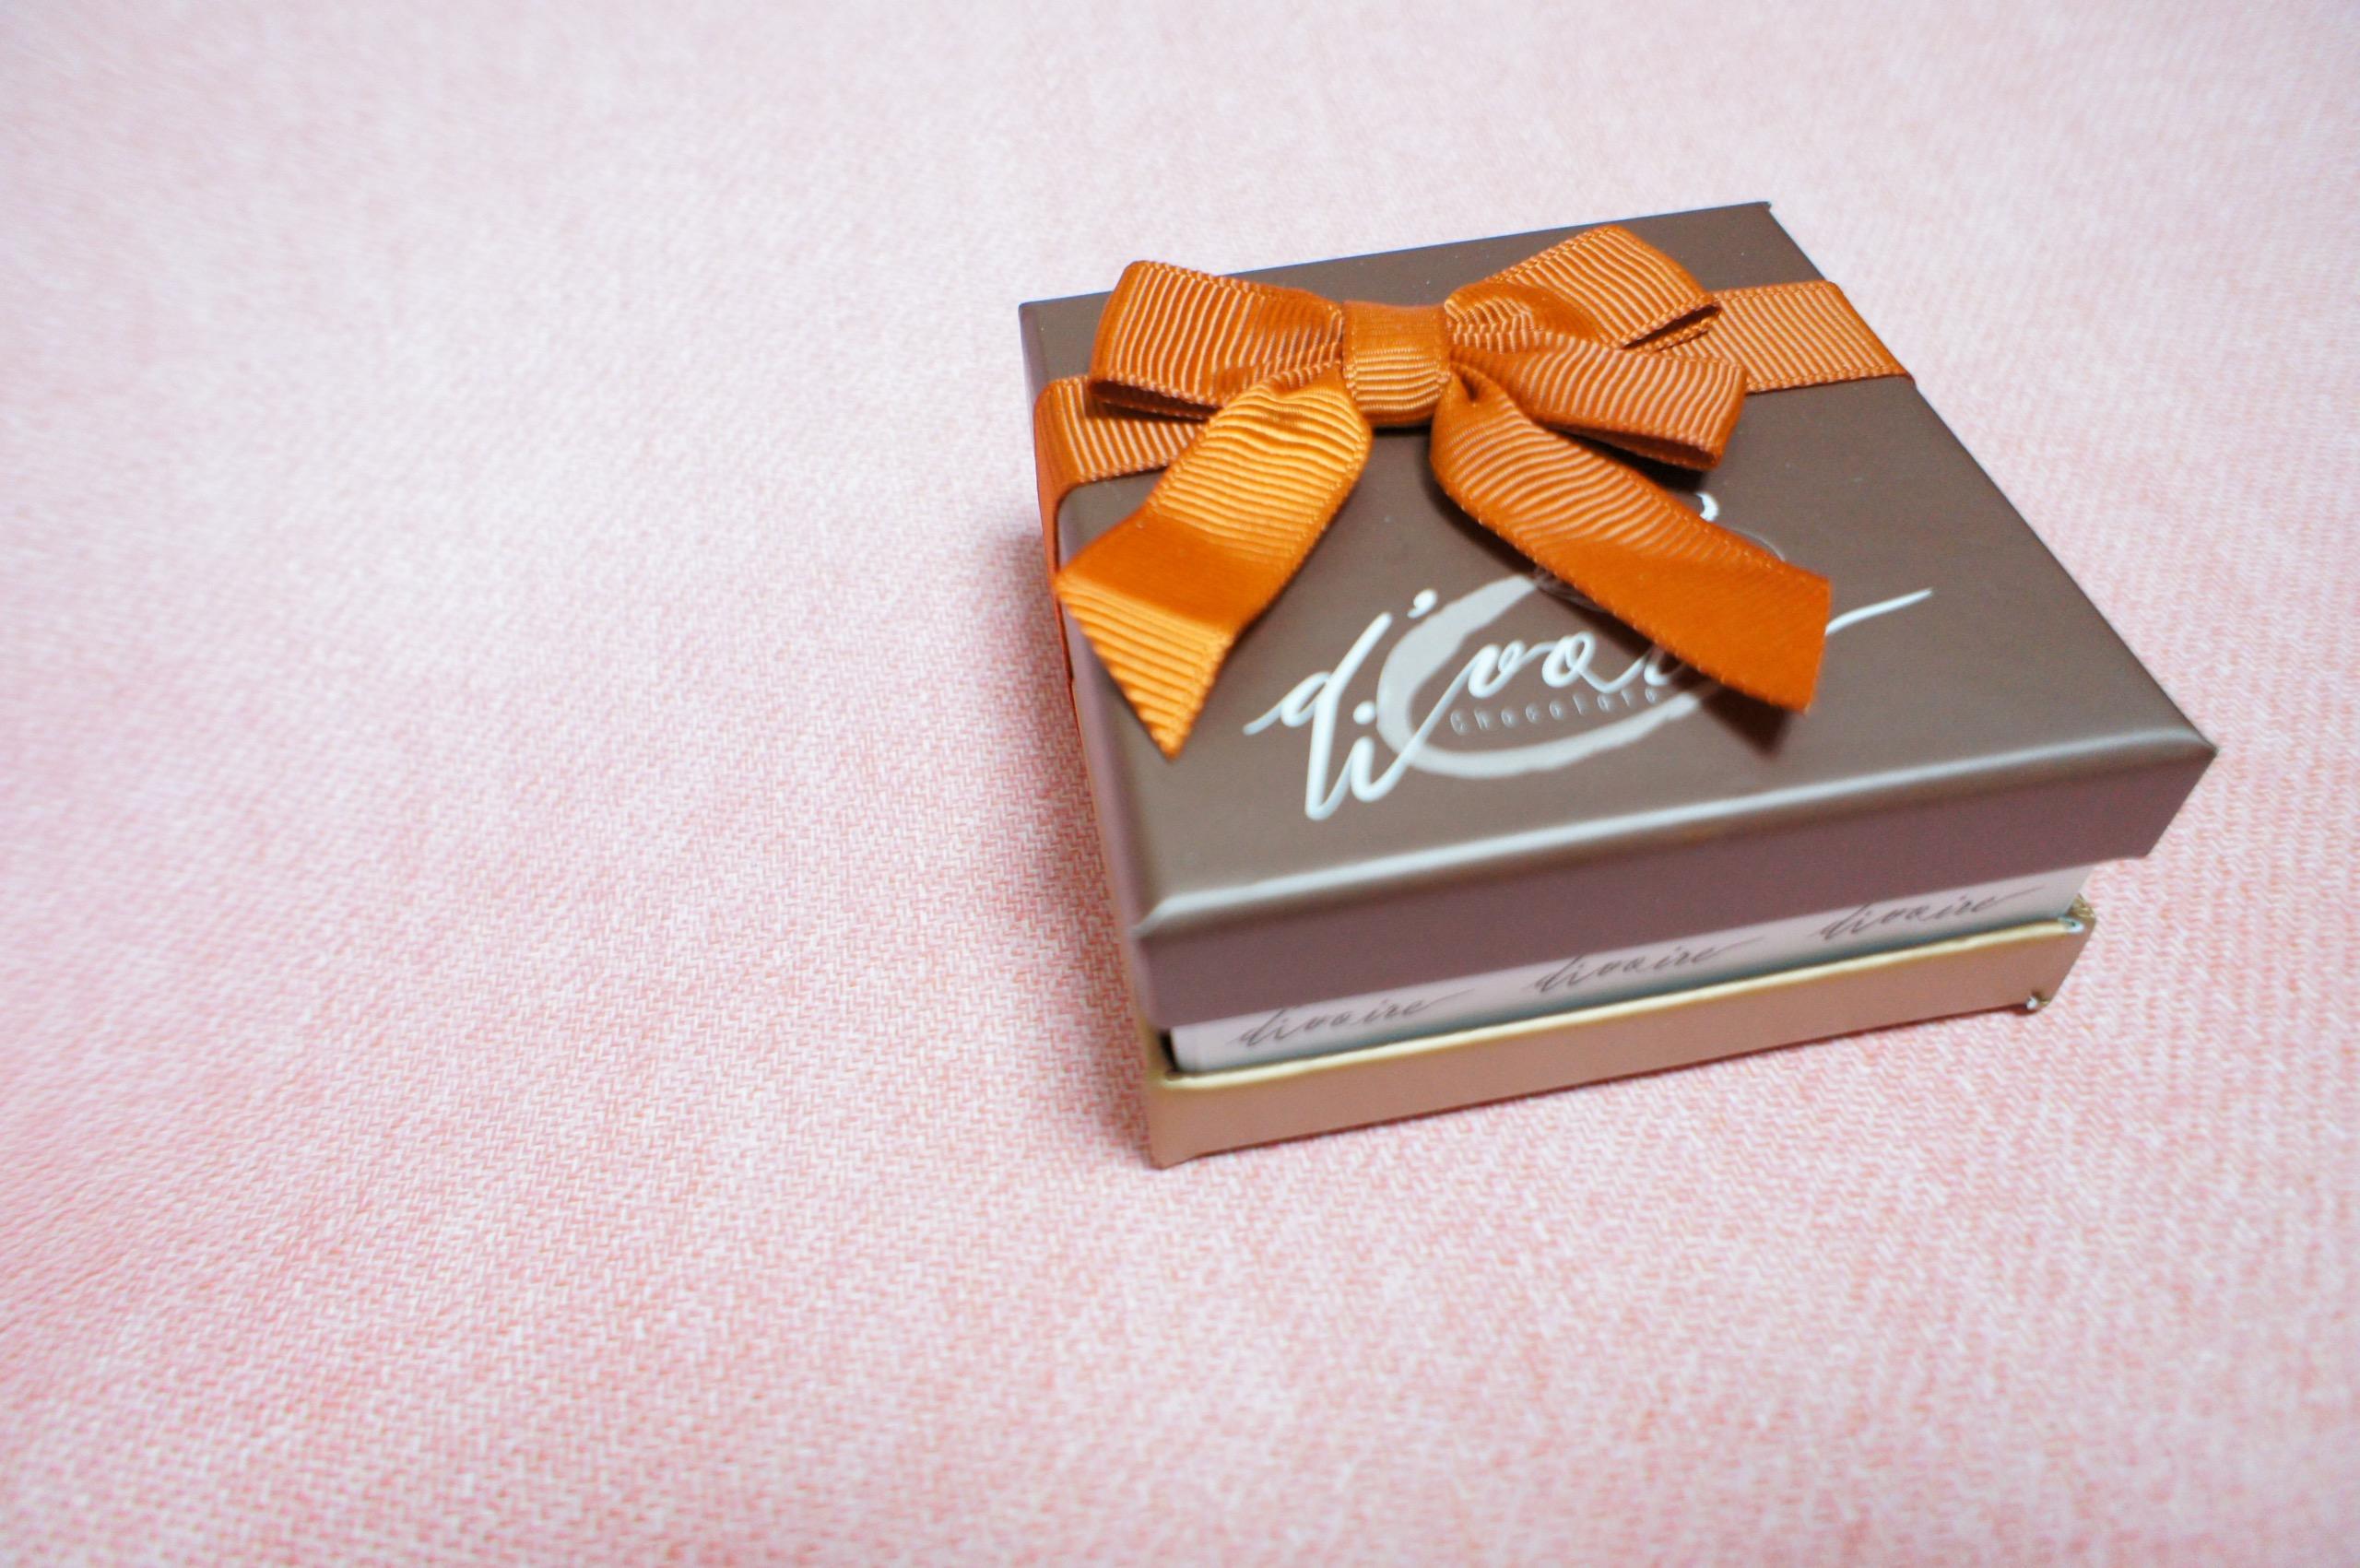 《ALL ¥1,000以下❤️》大丸東京店で買える【バレンタイン】おすすめチョコ3選☻!_4